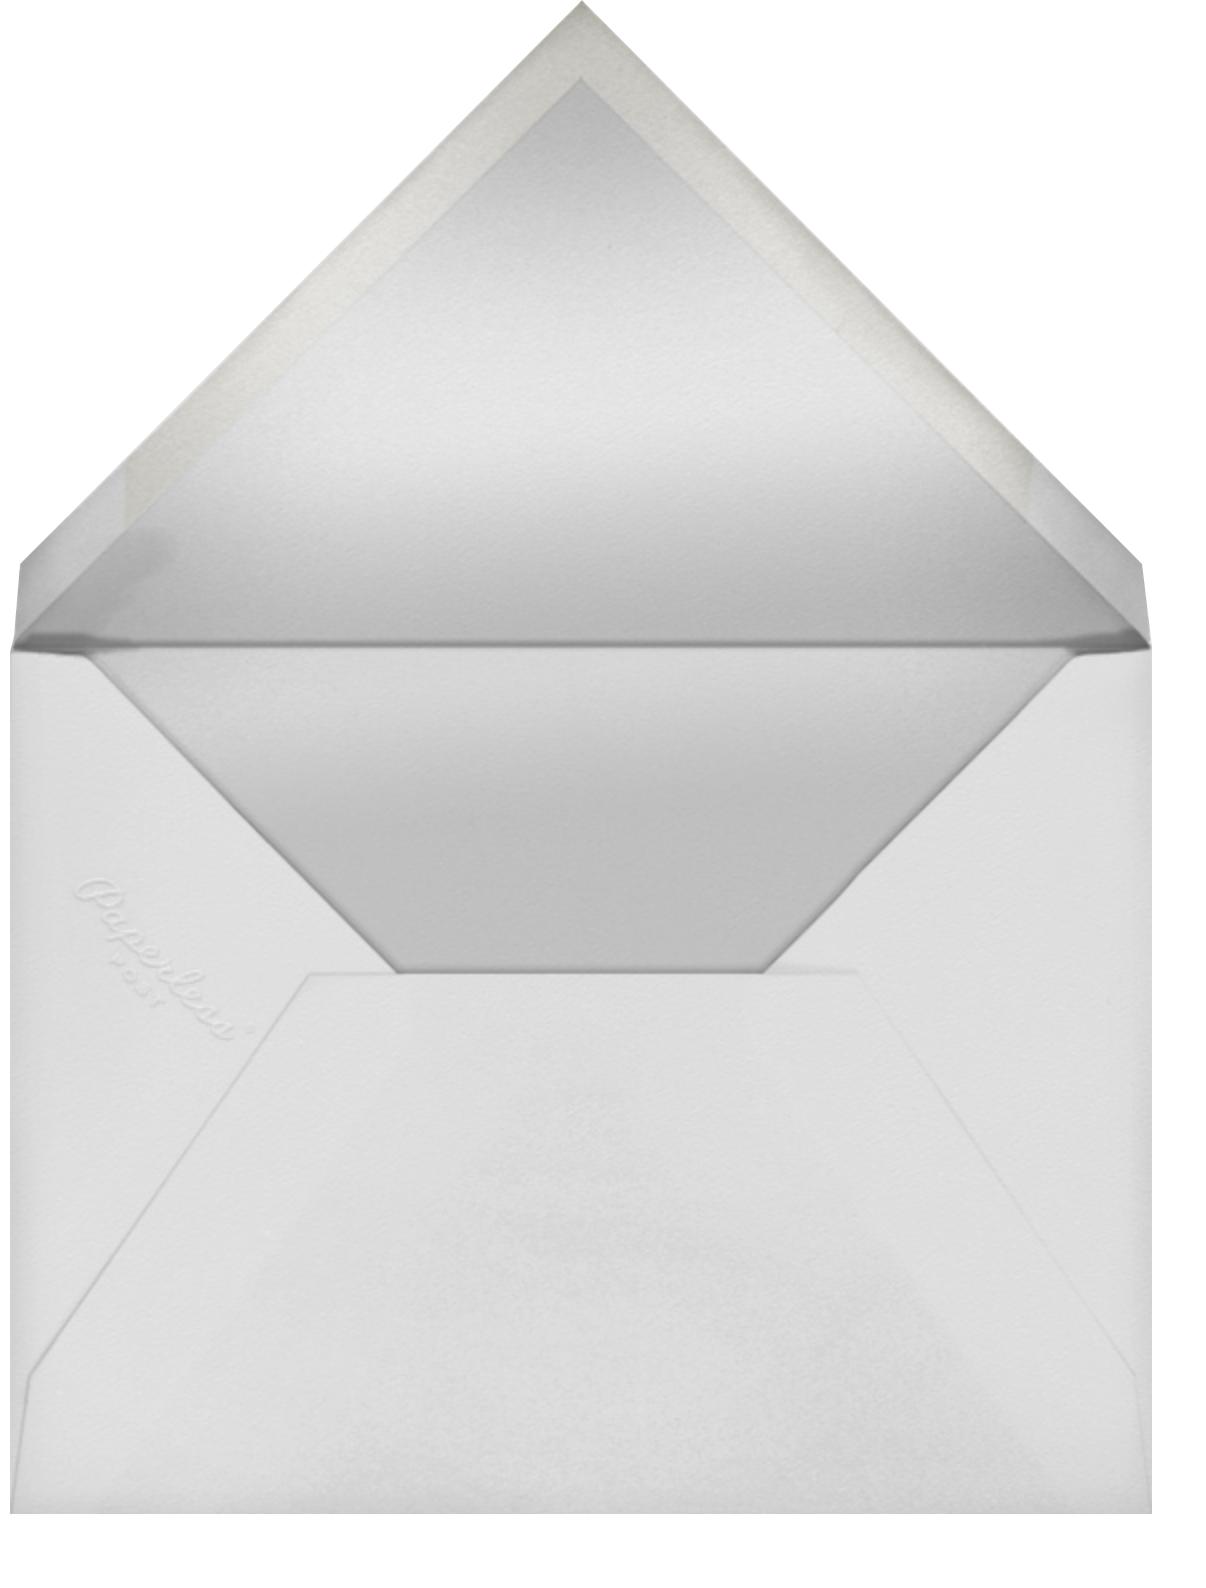 Kayitz II (Menu) - Oyster - Paperless Post - Menus - envelope back